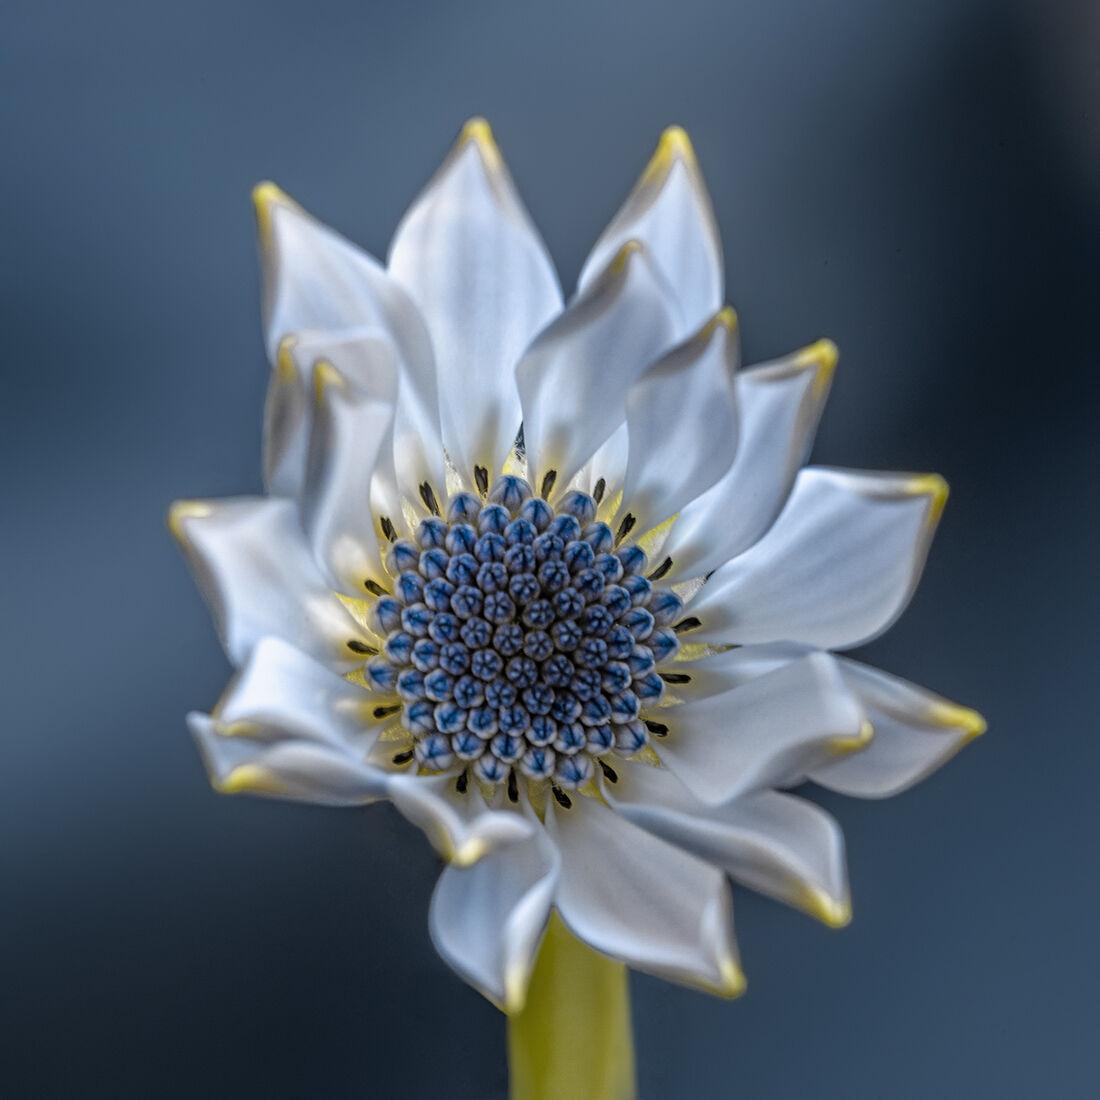 I dreamed of a flower...